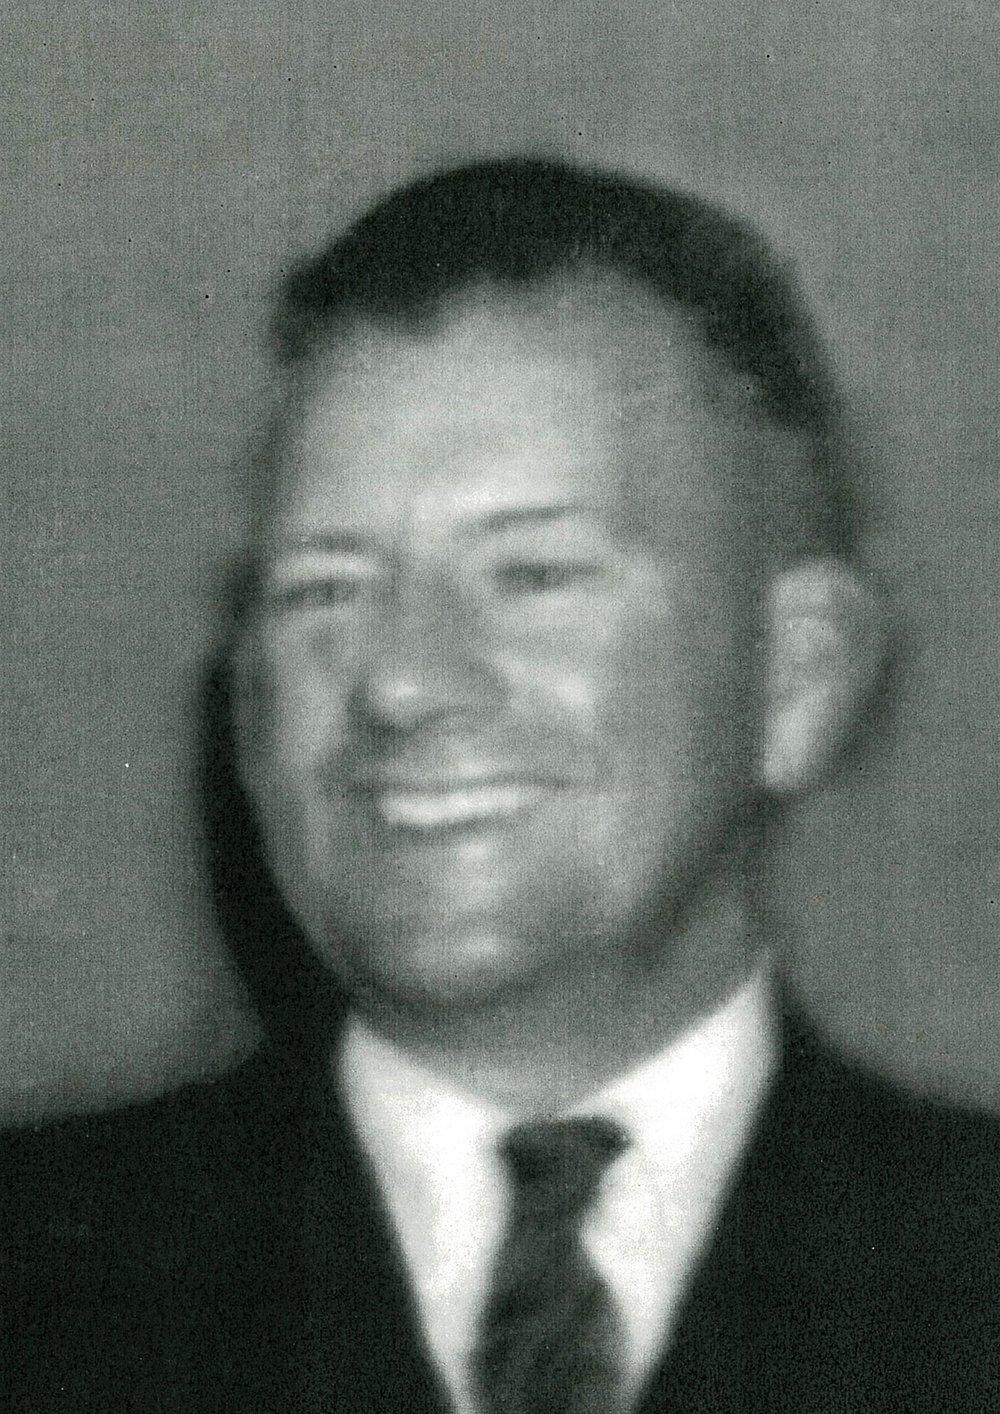 1956 - Harold Kennedy*